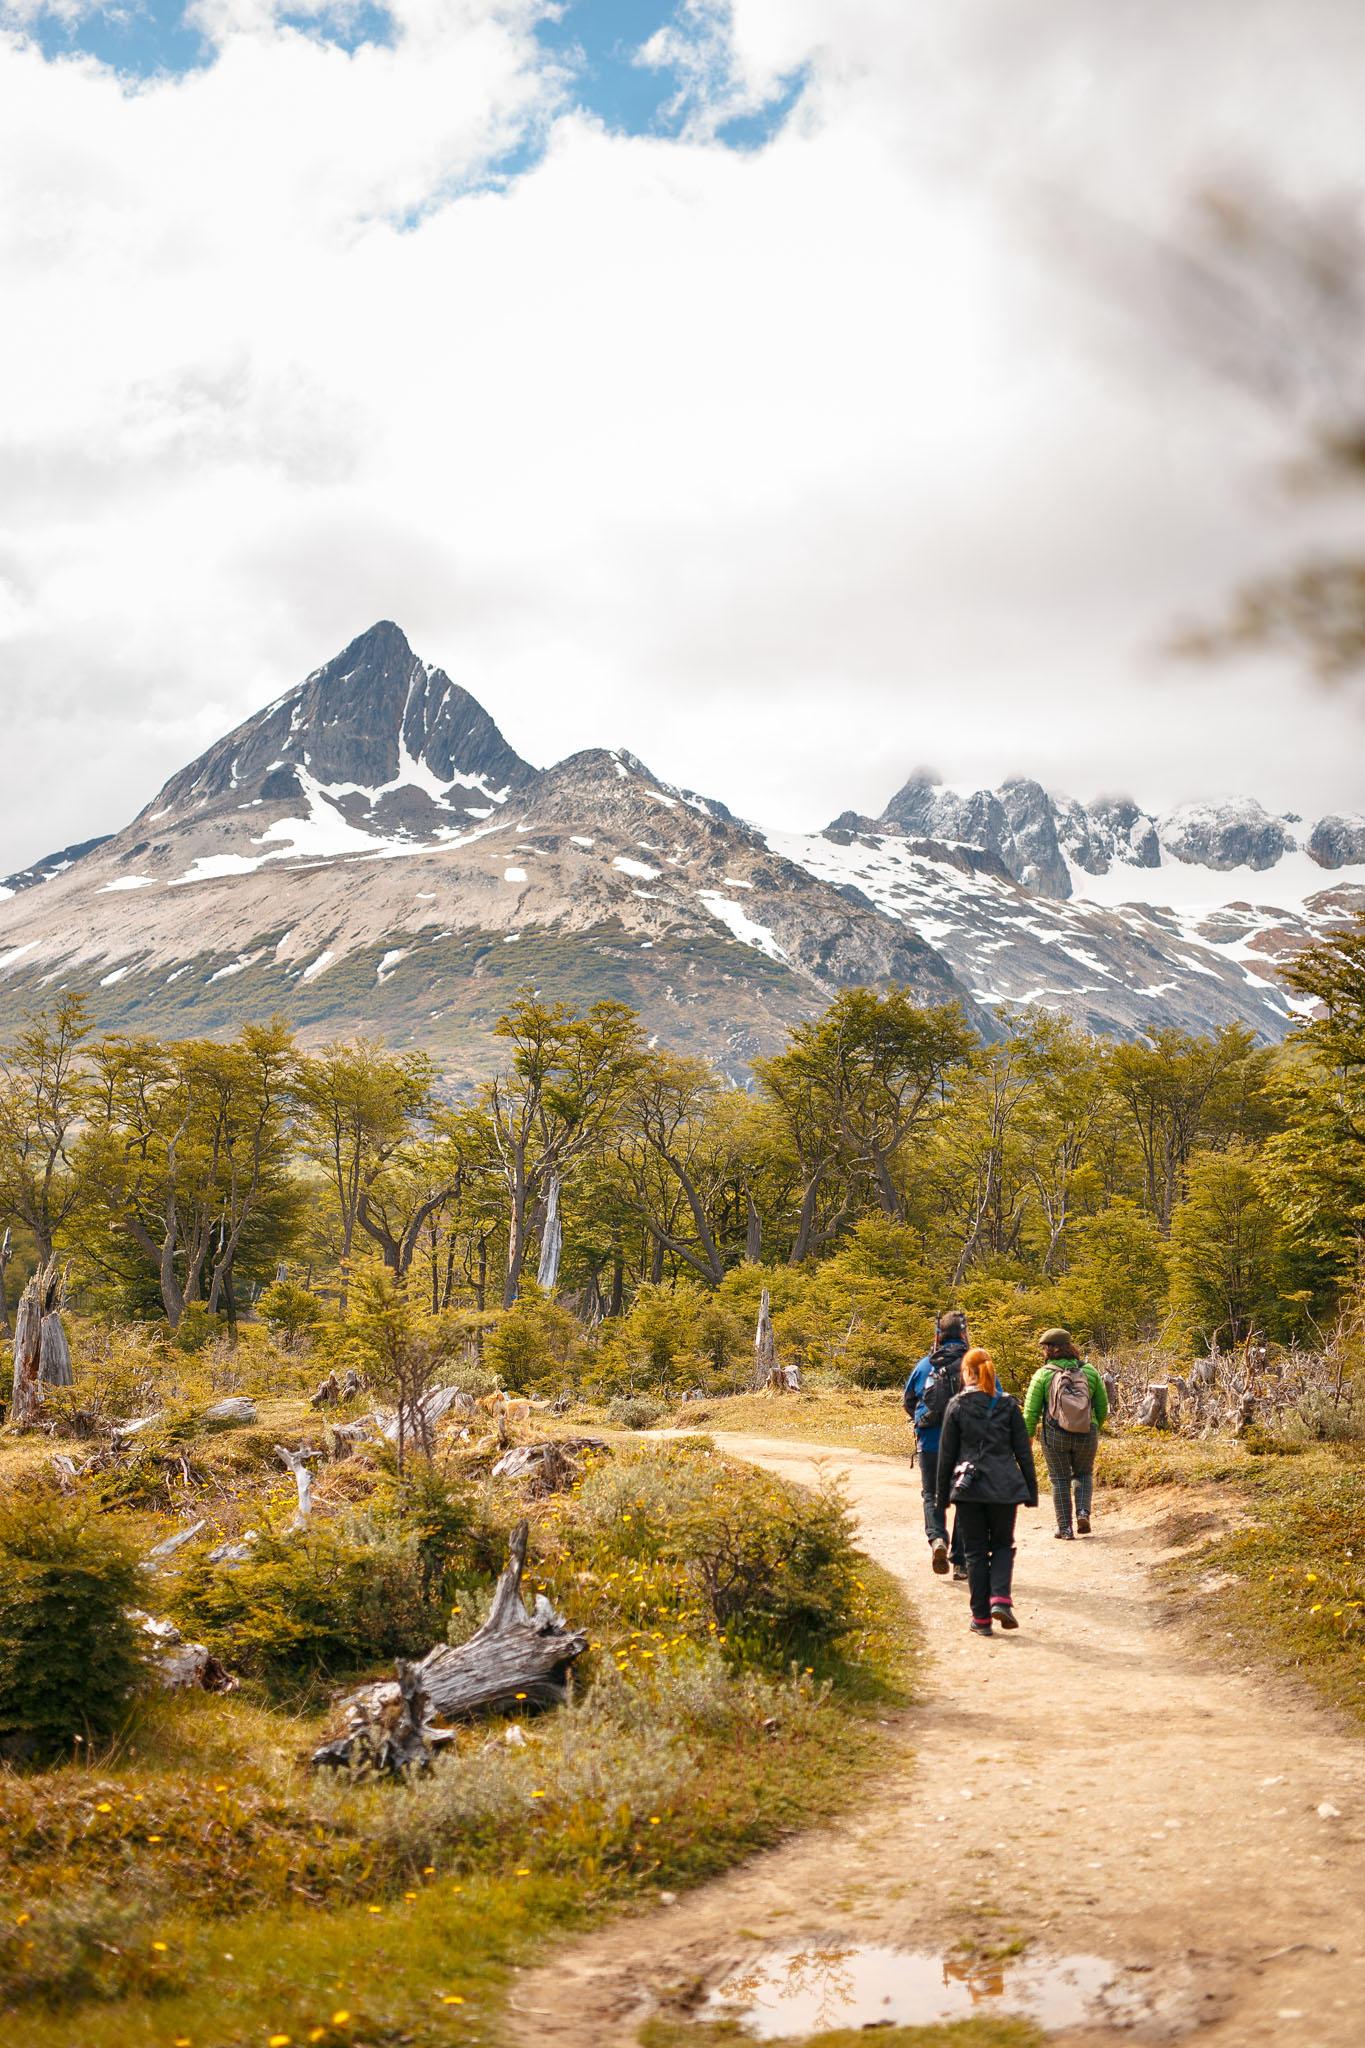 Wedding_Travellers_Ushuaia_Overlanding_fin_del_mundo-laguna-esmeralda-mountains-snow-forest-path-people